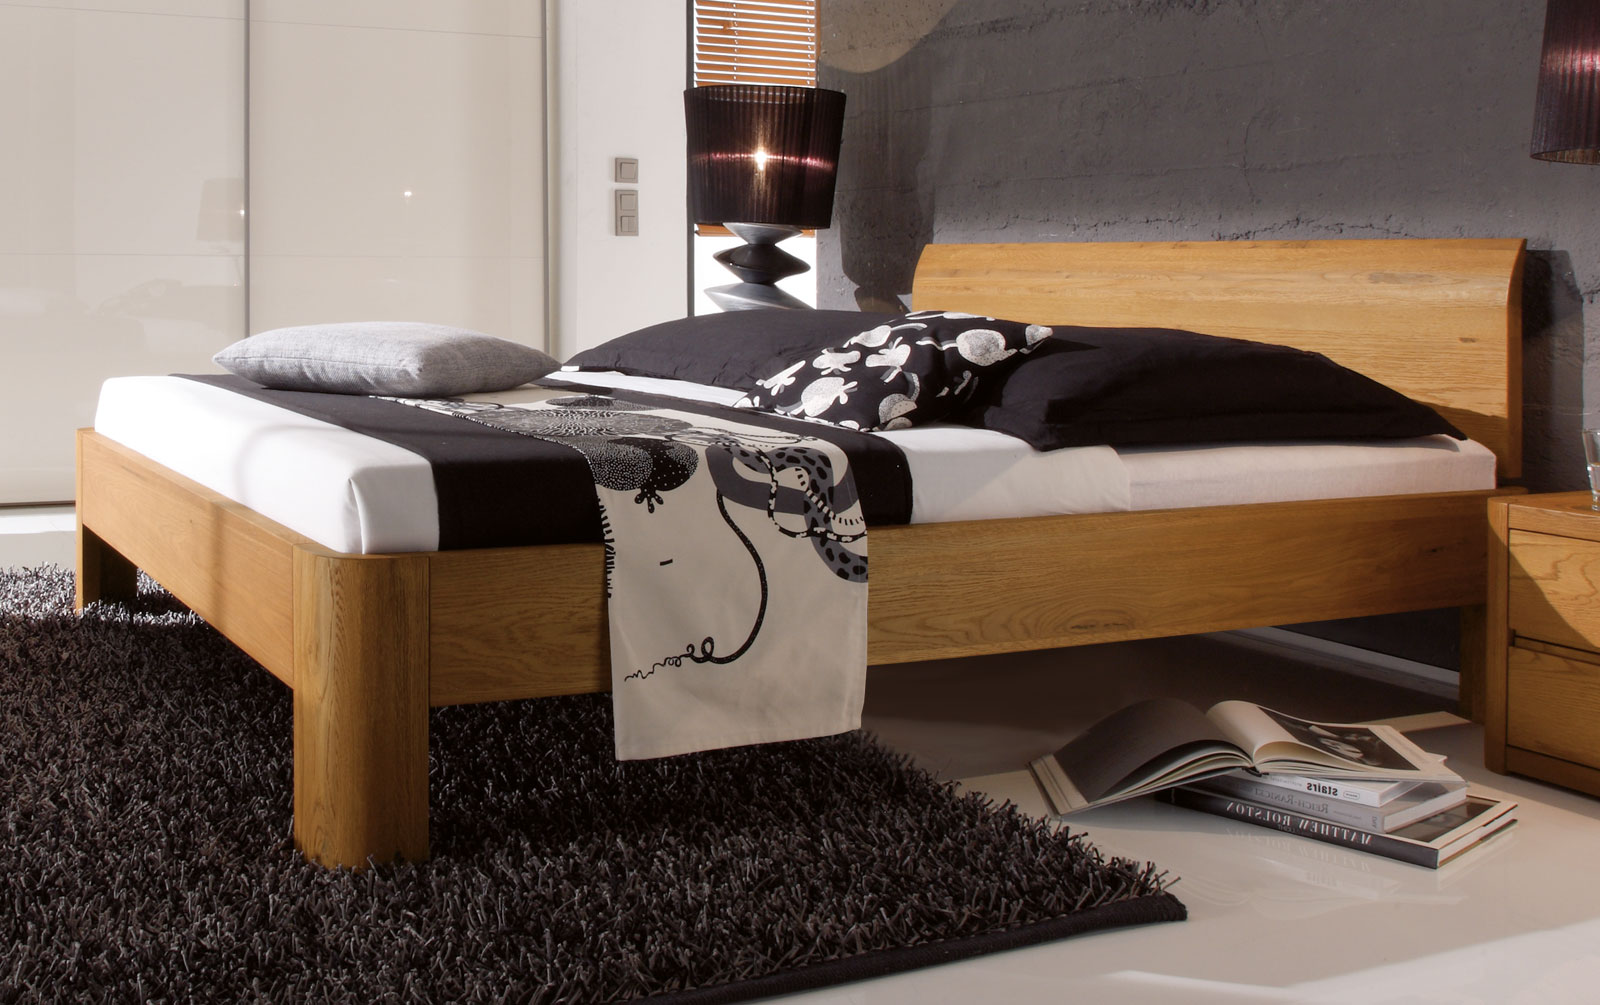 Bett in z.B. 120x200 cm Größe aus Massivholz - Santa Clara